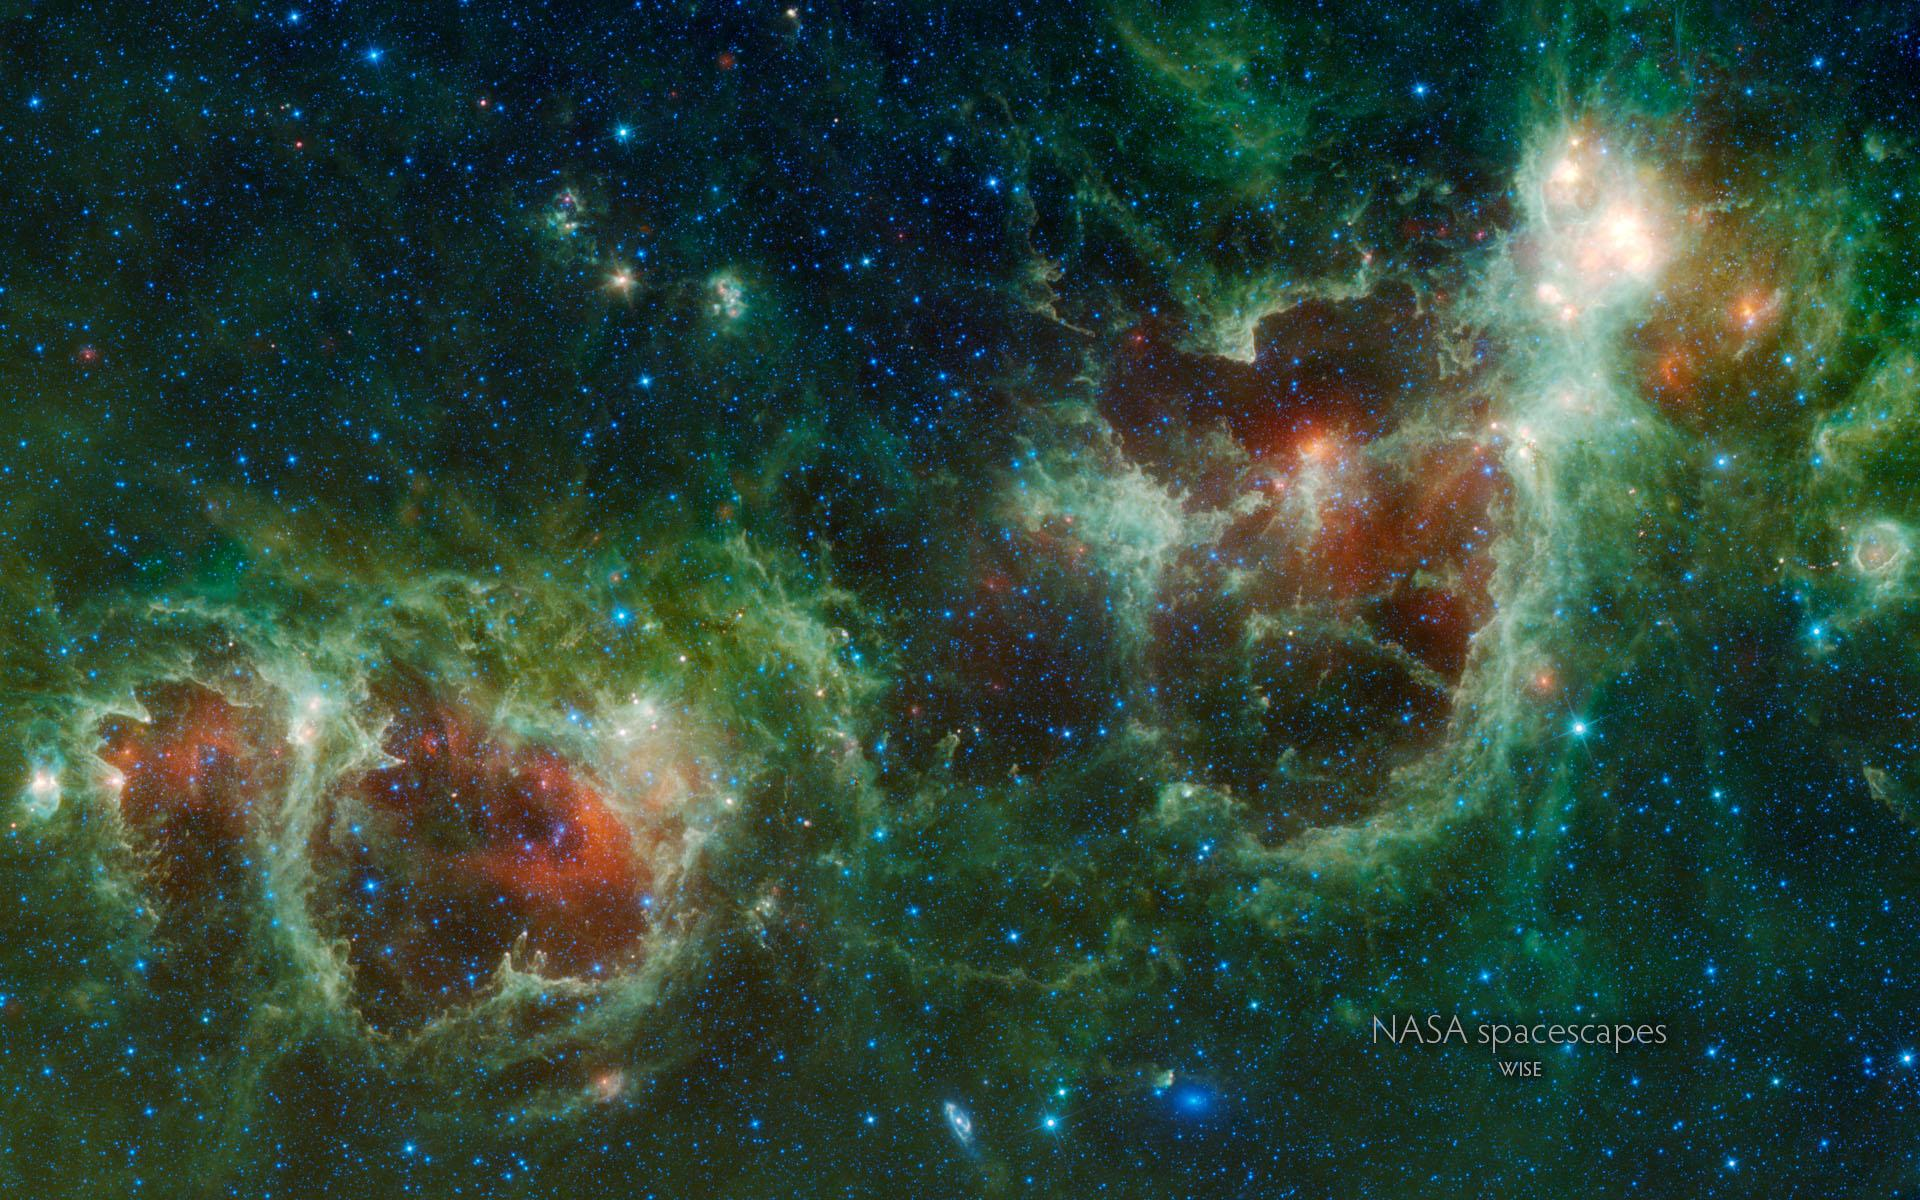 NASA Spacescapes Wallpaper - WallpaperSafari